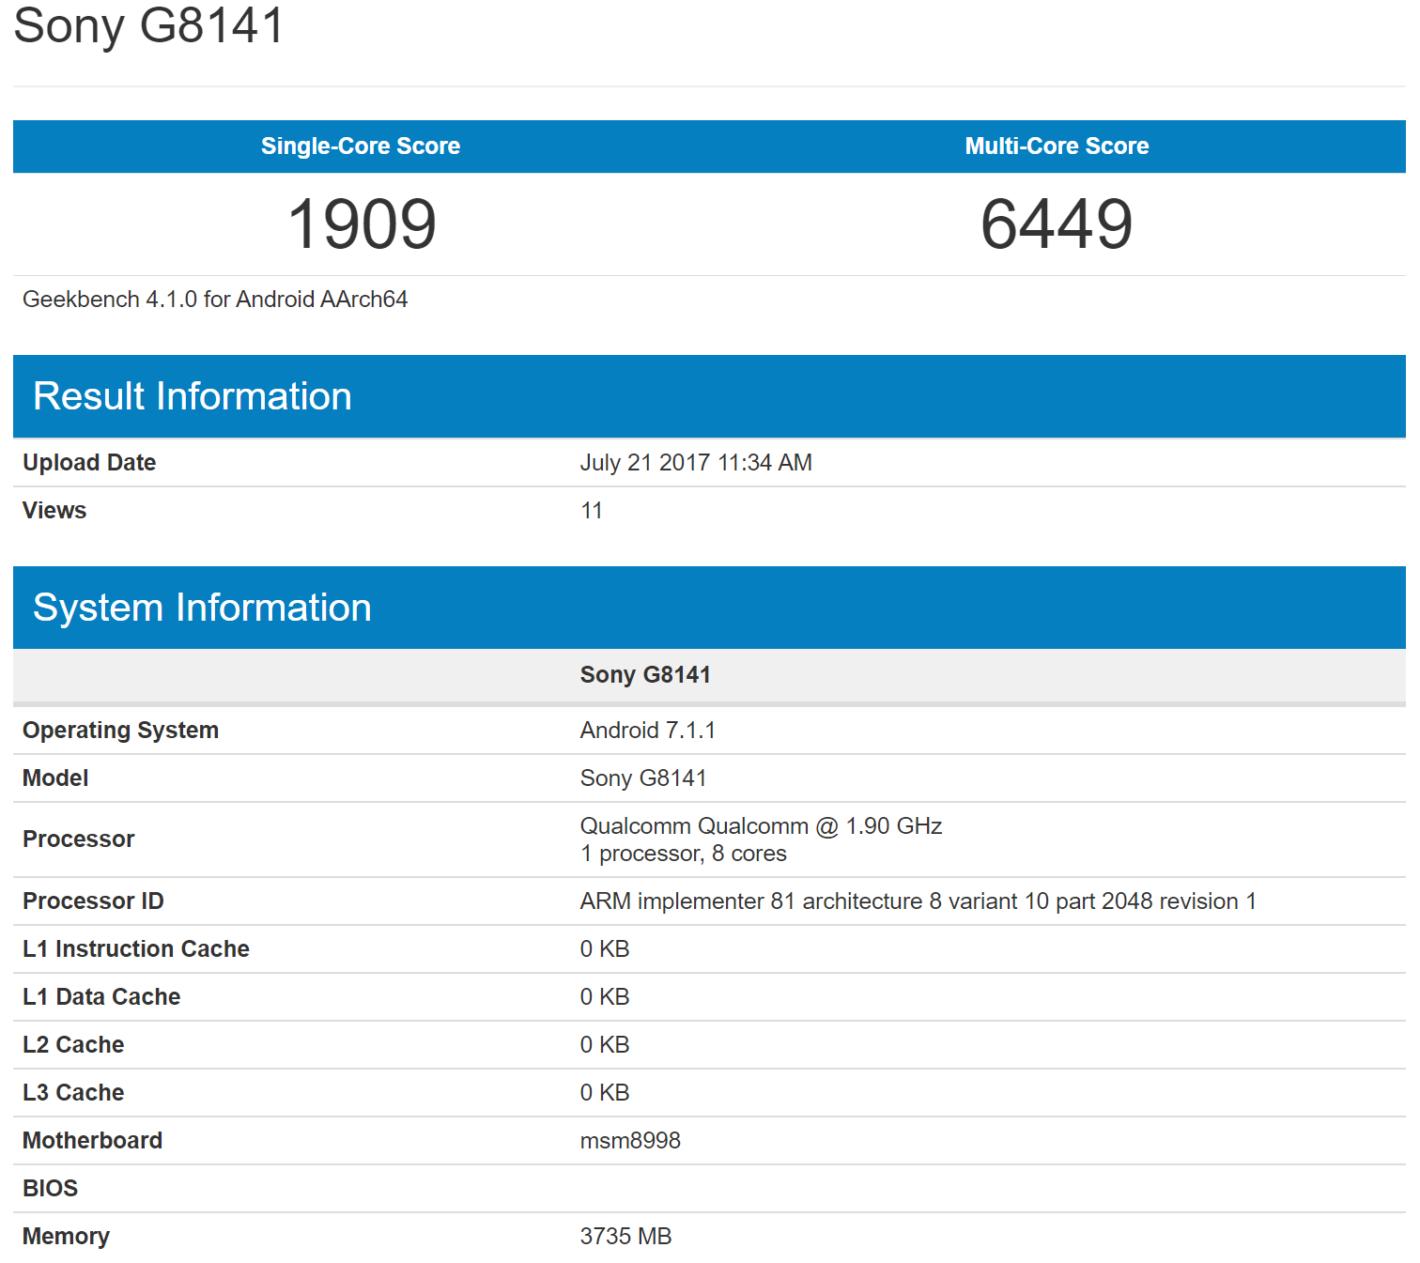 Sony G8141 Geekbench